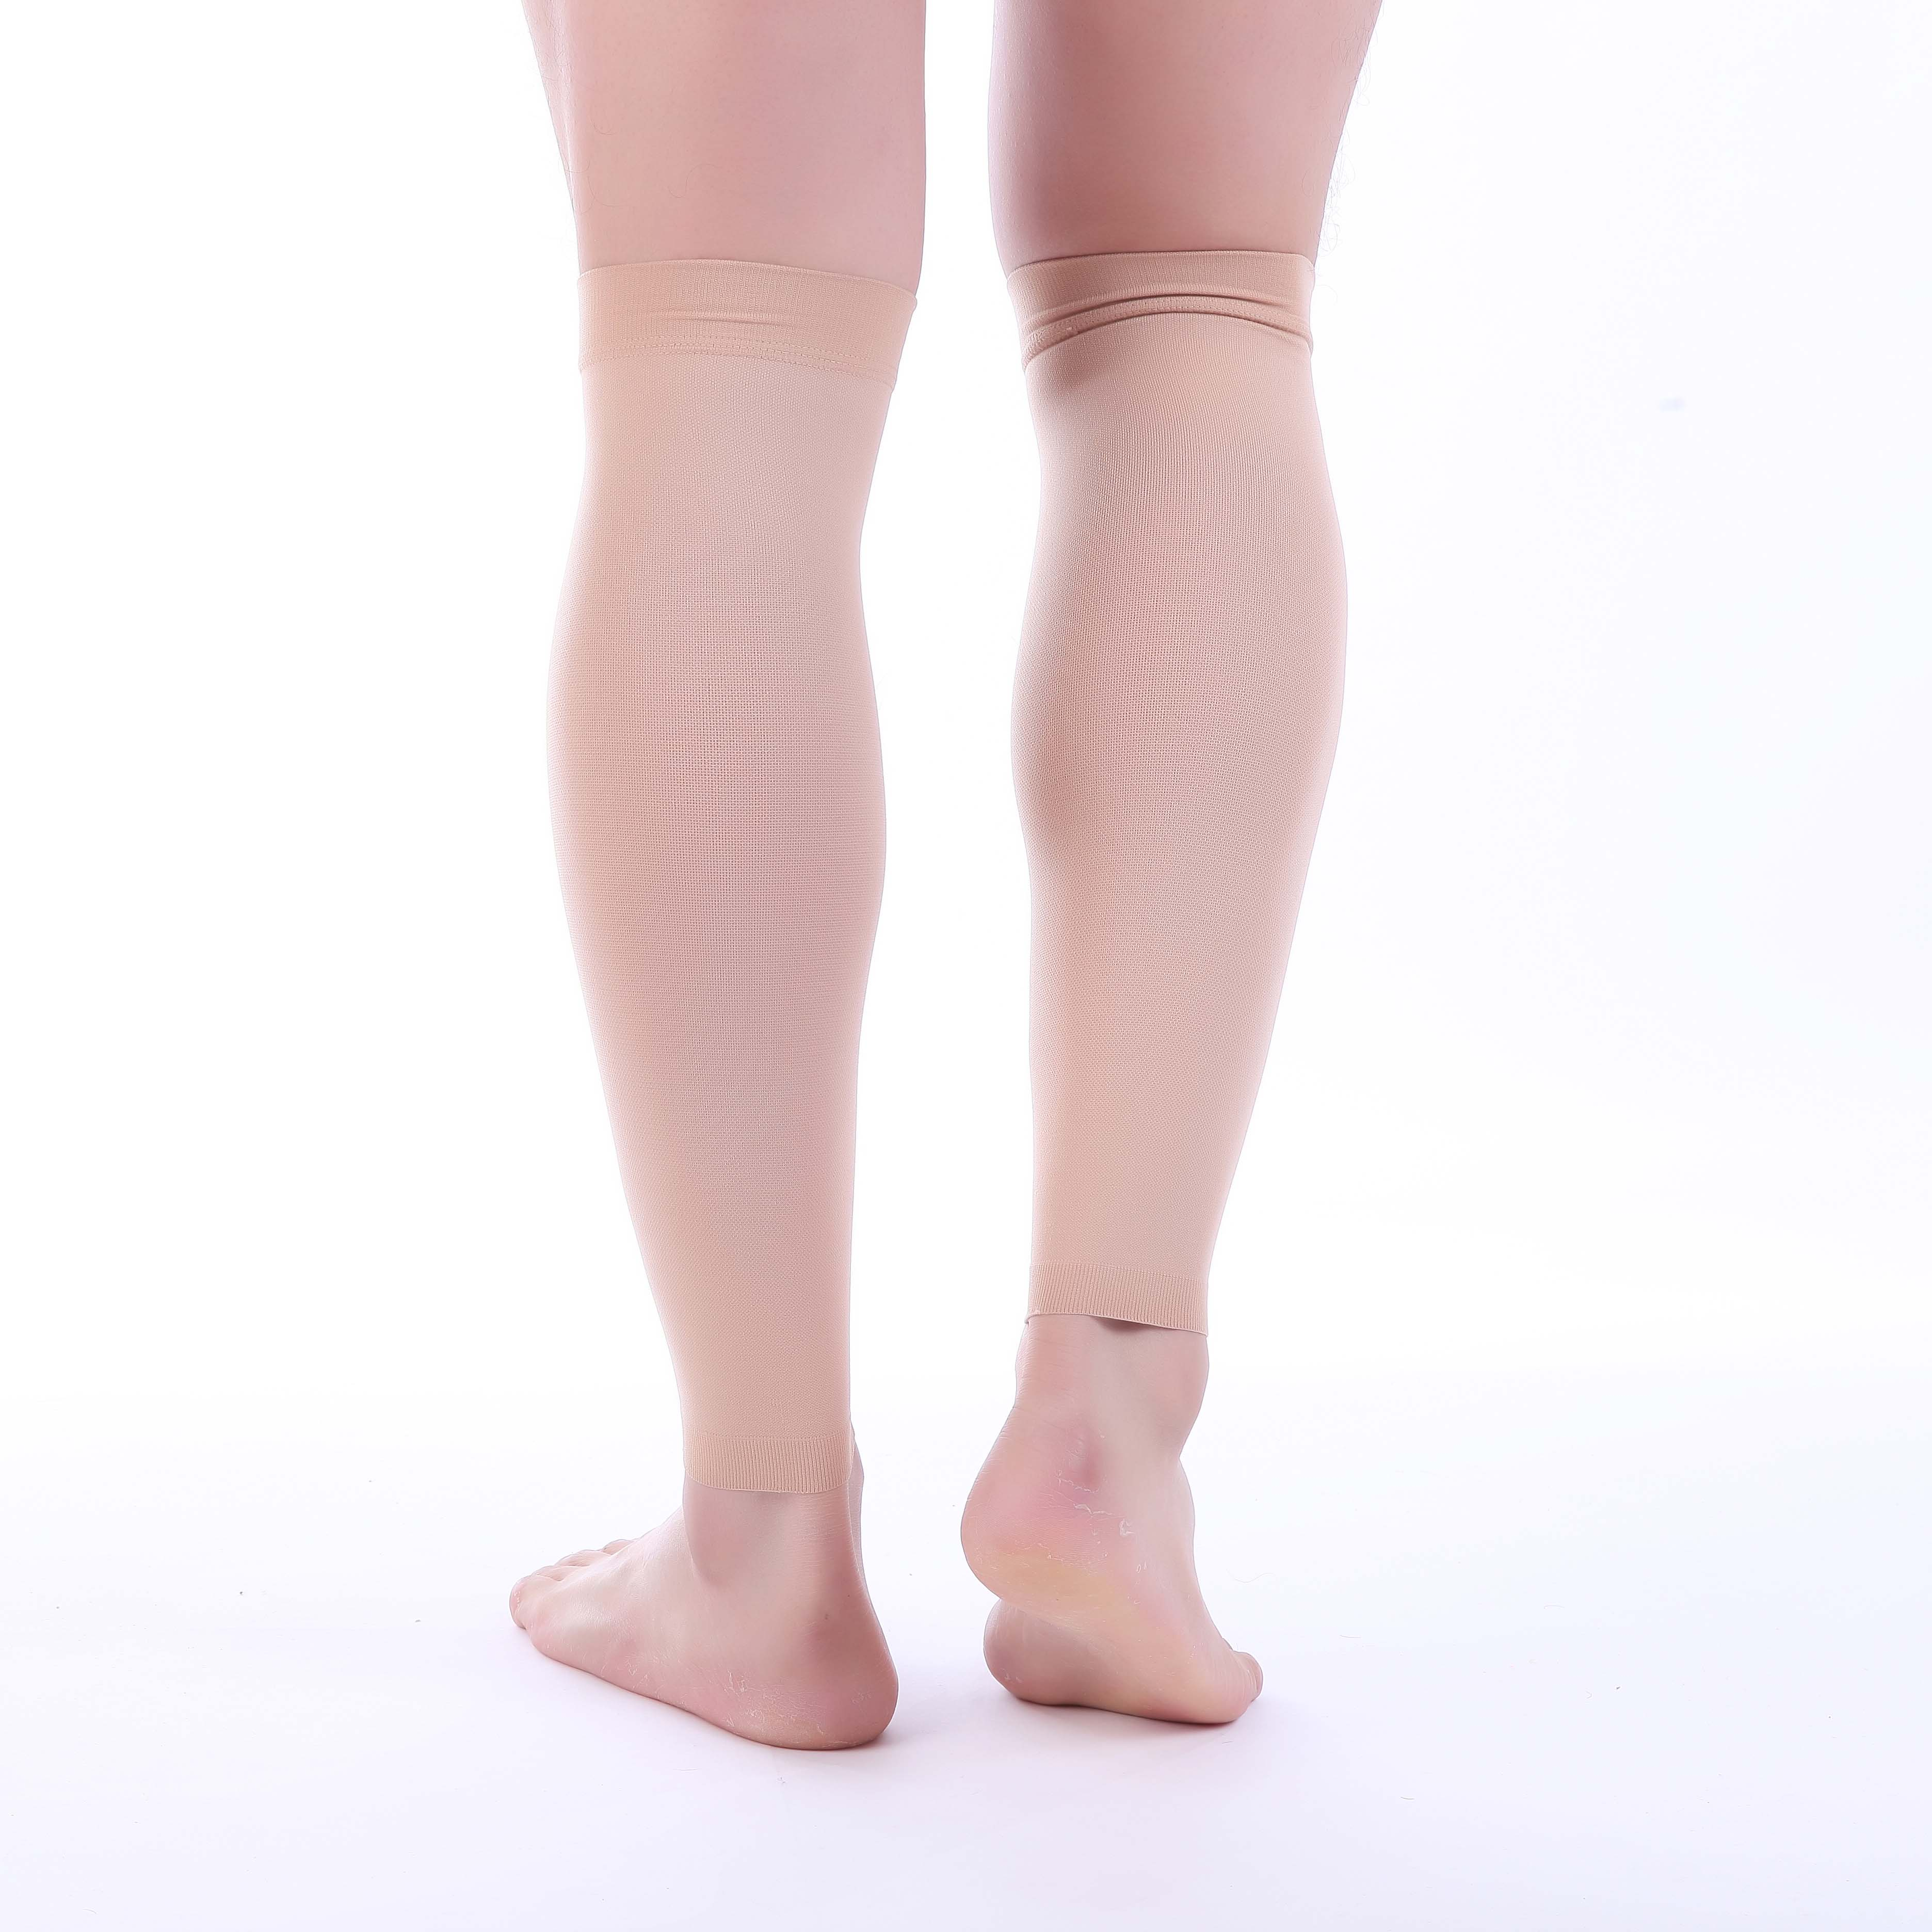 1 Pair 30-40 mmHg Support Venous Insufficiency Surgery Recovery Shin Splints Varicose Veins Jet Black, Medium Doc Miller Calf Compression Sleeve